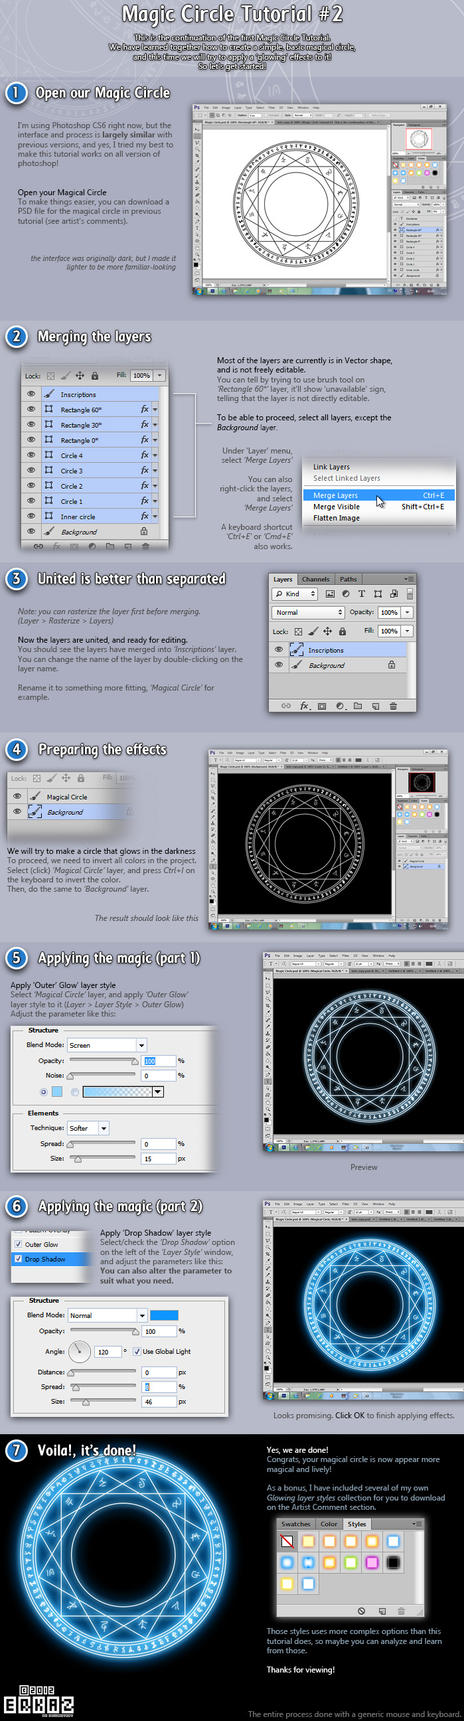 Tutorial: Basic Magic Circle #2 by Erkaz